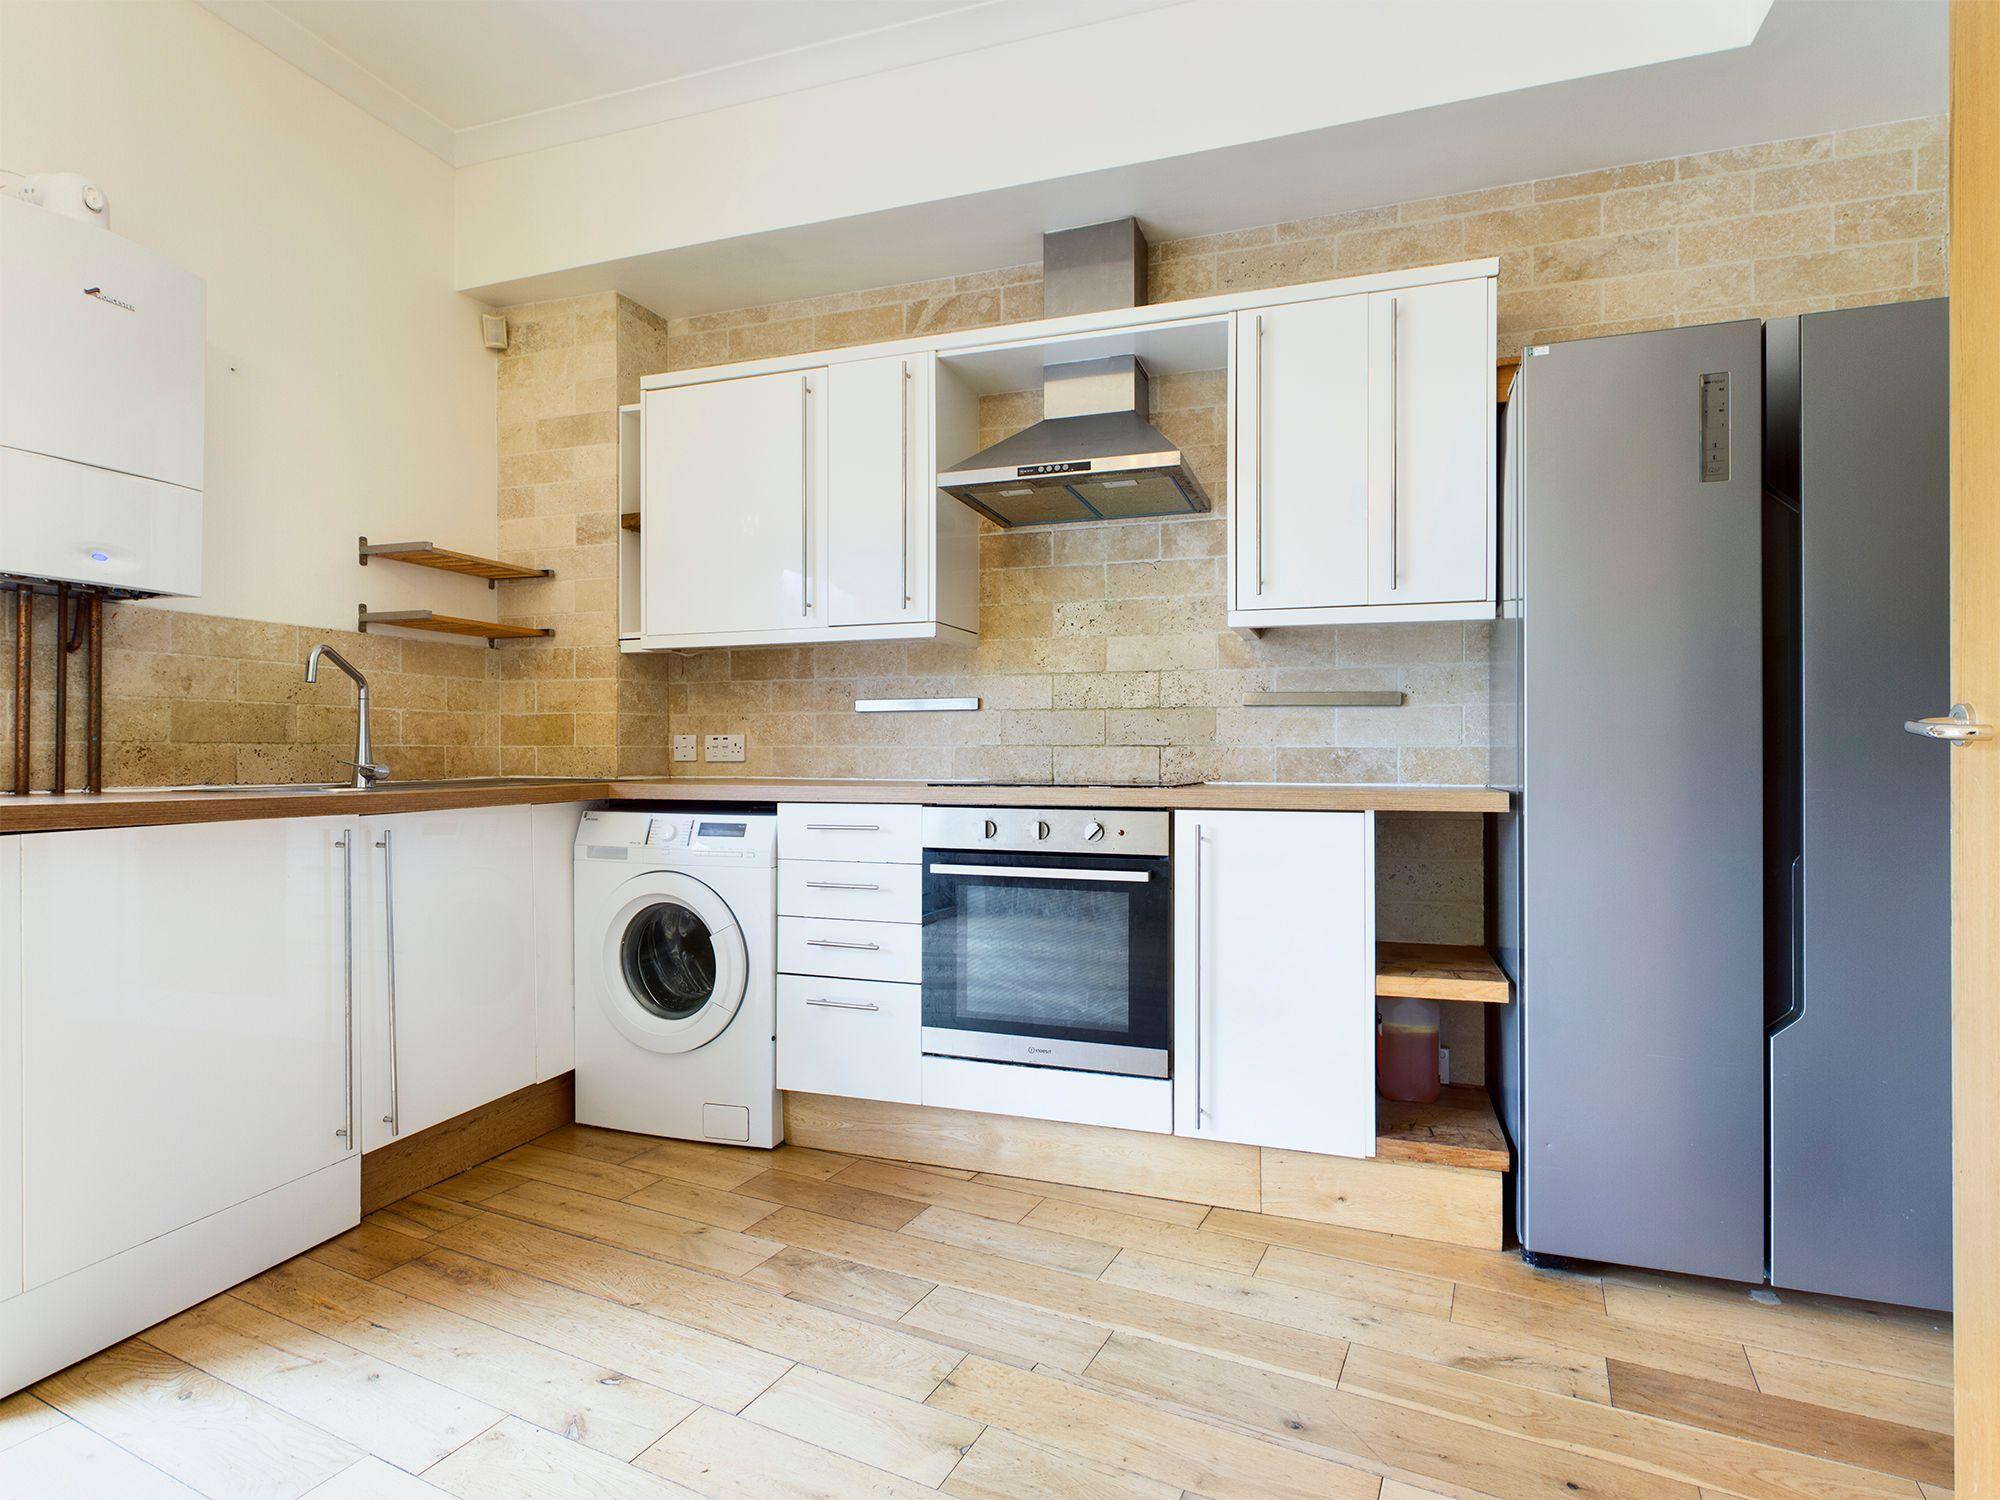 Property photo 1 of 17. Kitchen